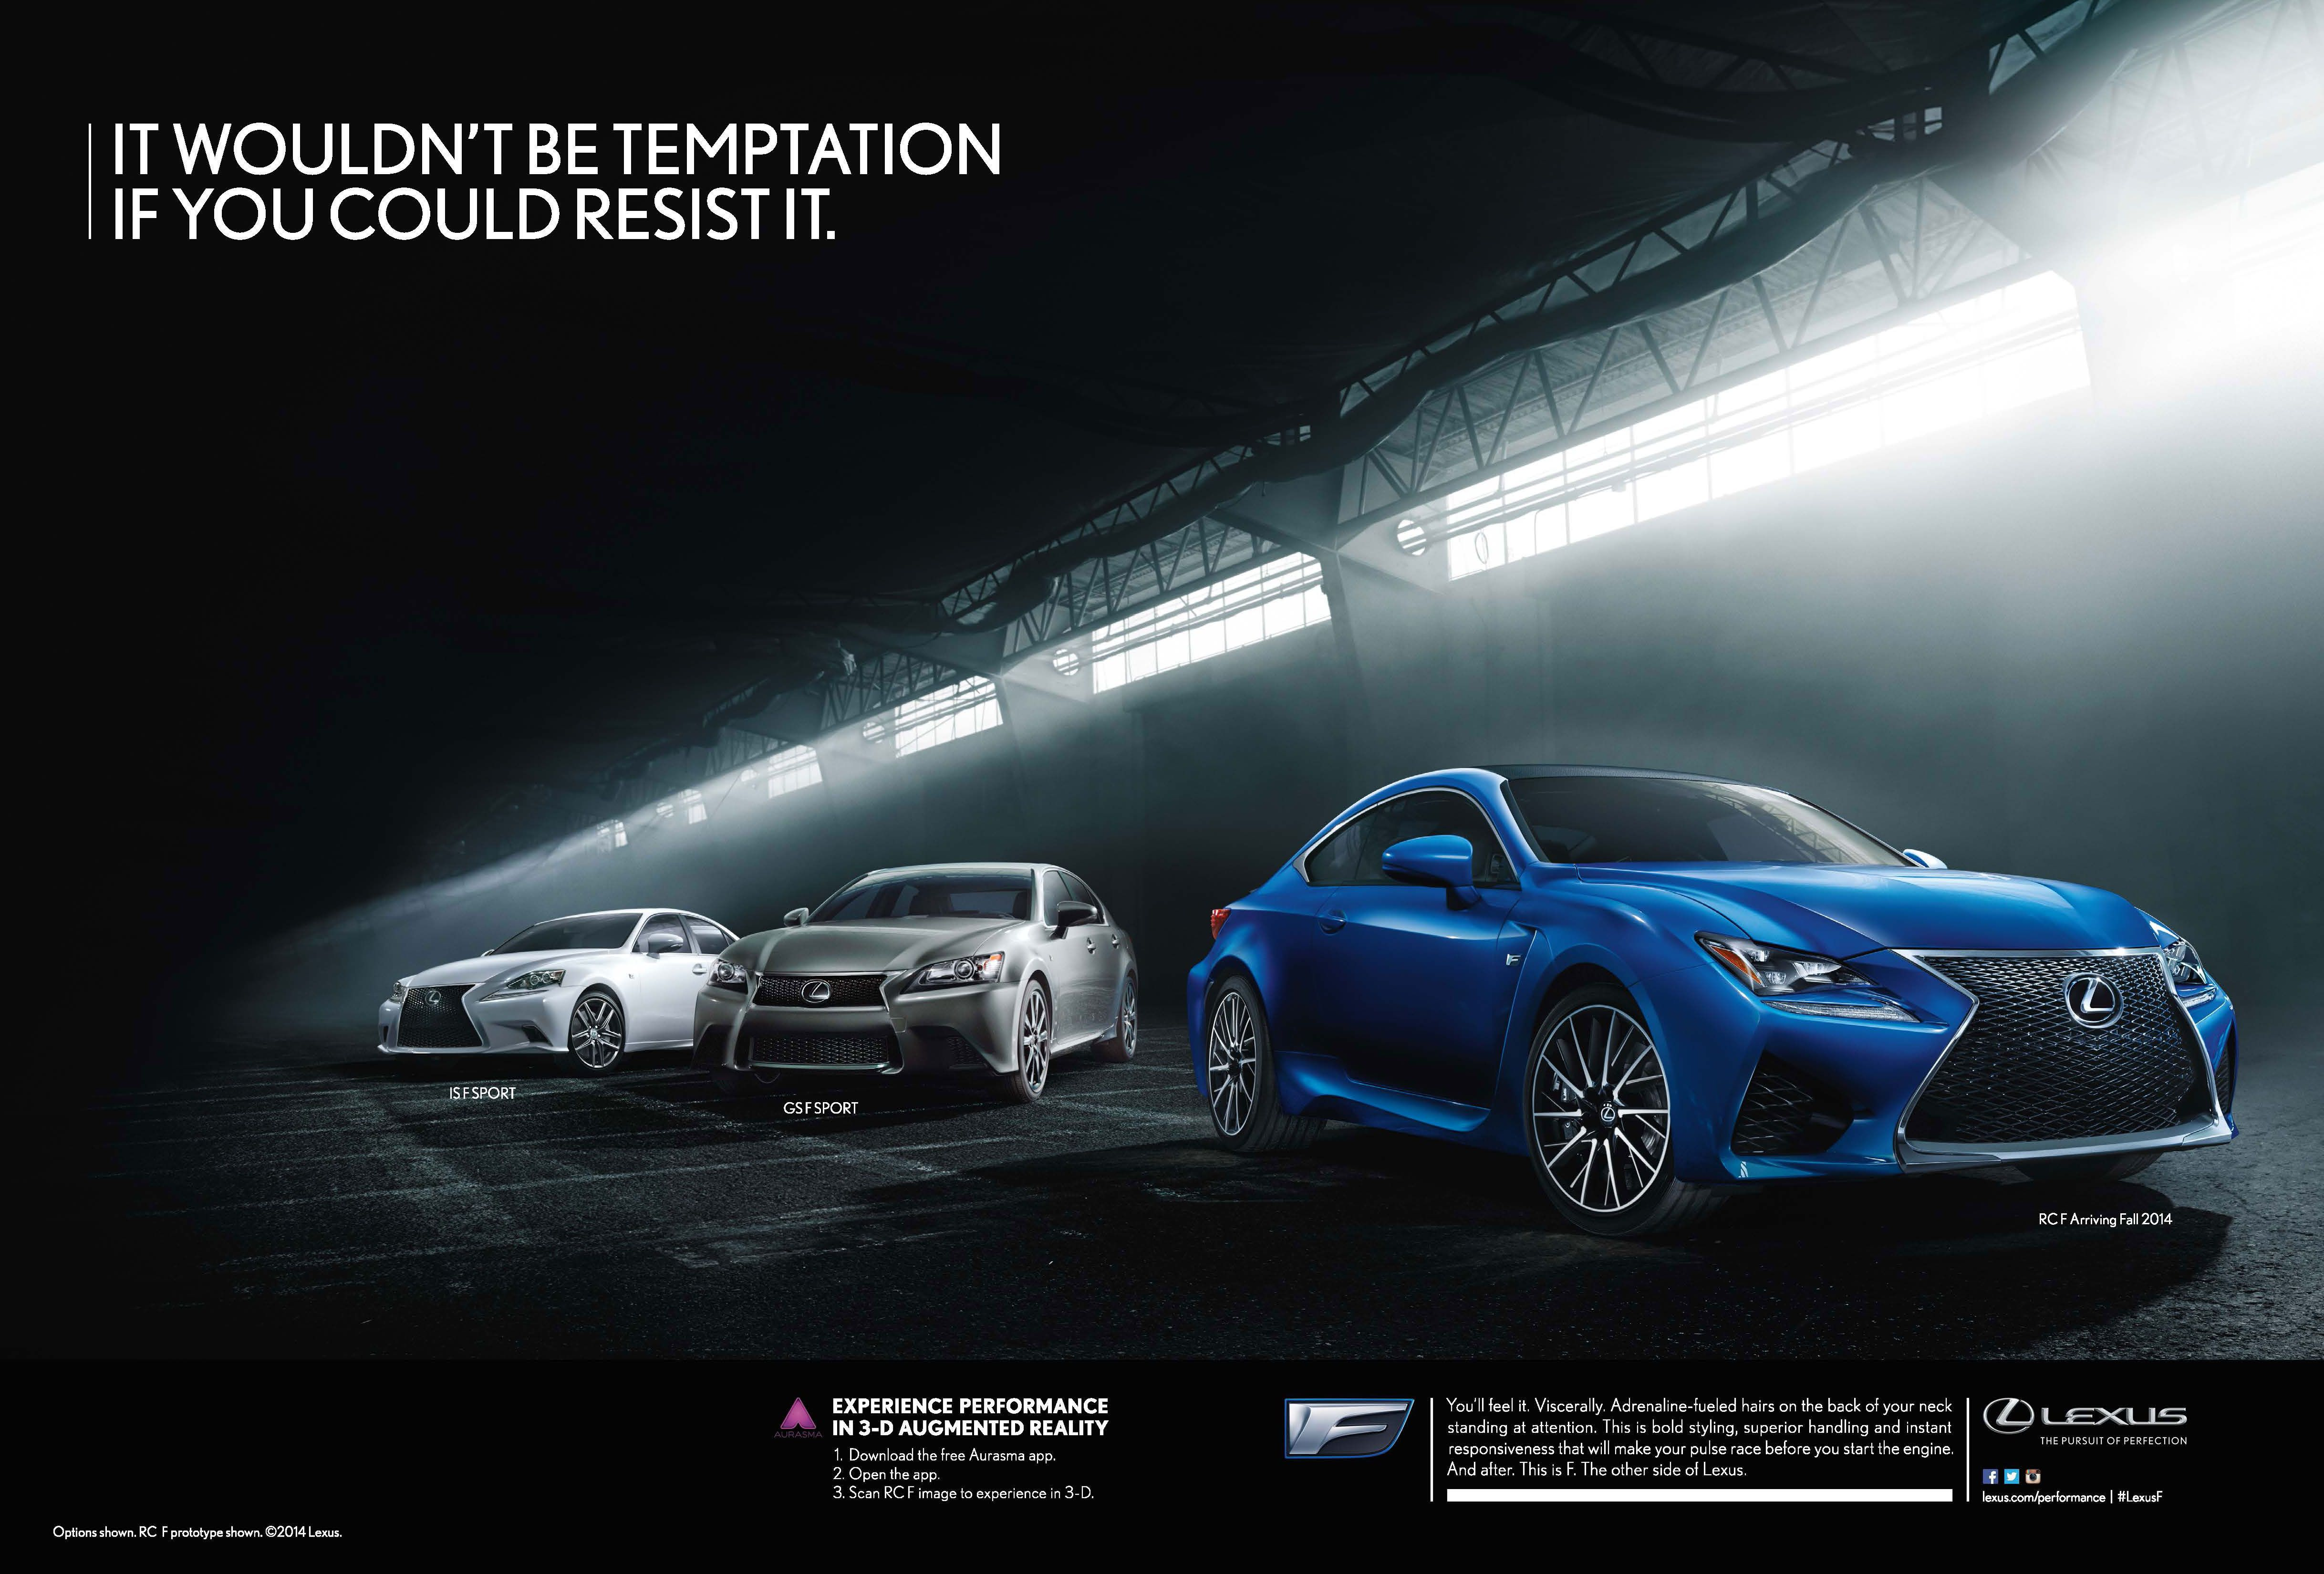 Brand Lexus Communication Objective Attitude To Maintain And Reinforce Lexus S Brand Image As Premium With Luxu Lexus Car Advertising Design Car Advertising